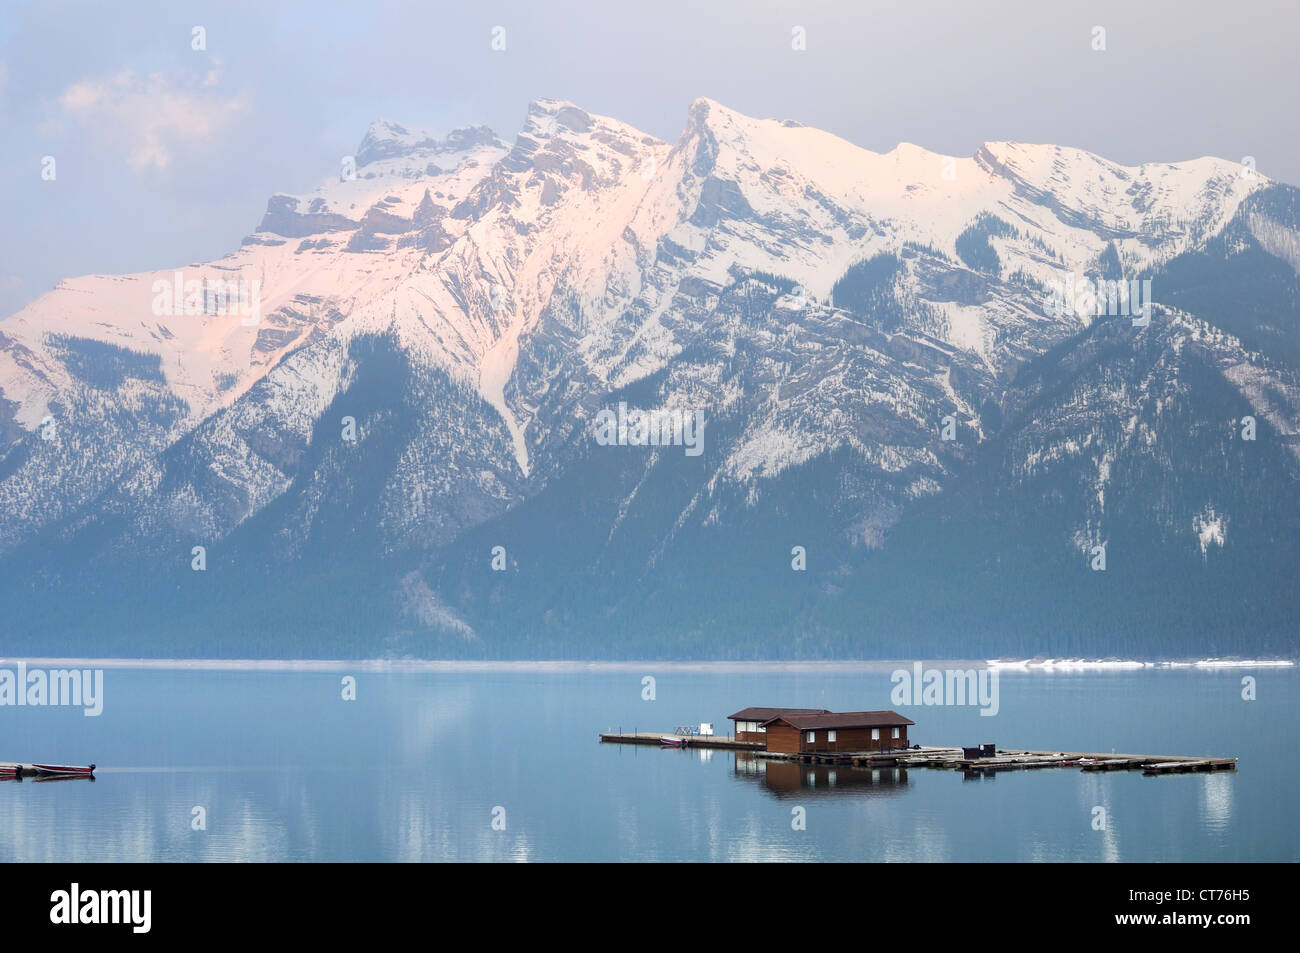 moorage at minnewanka lake - Stock Image